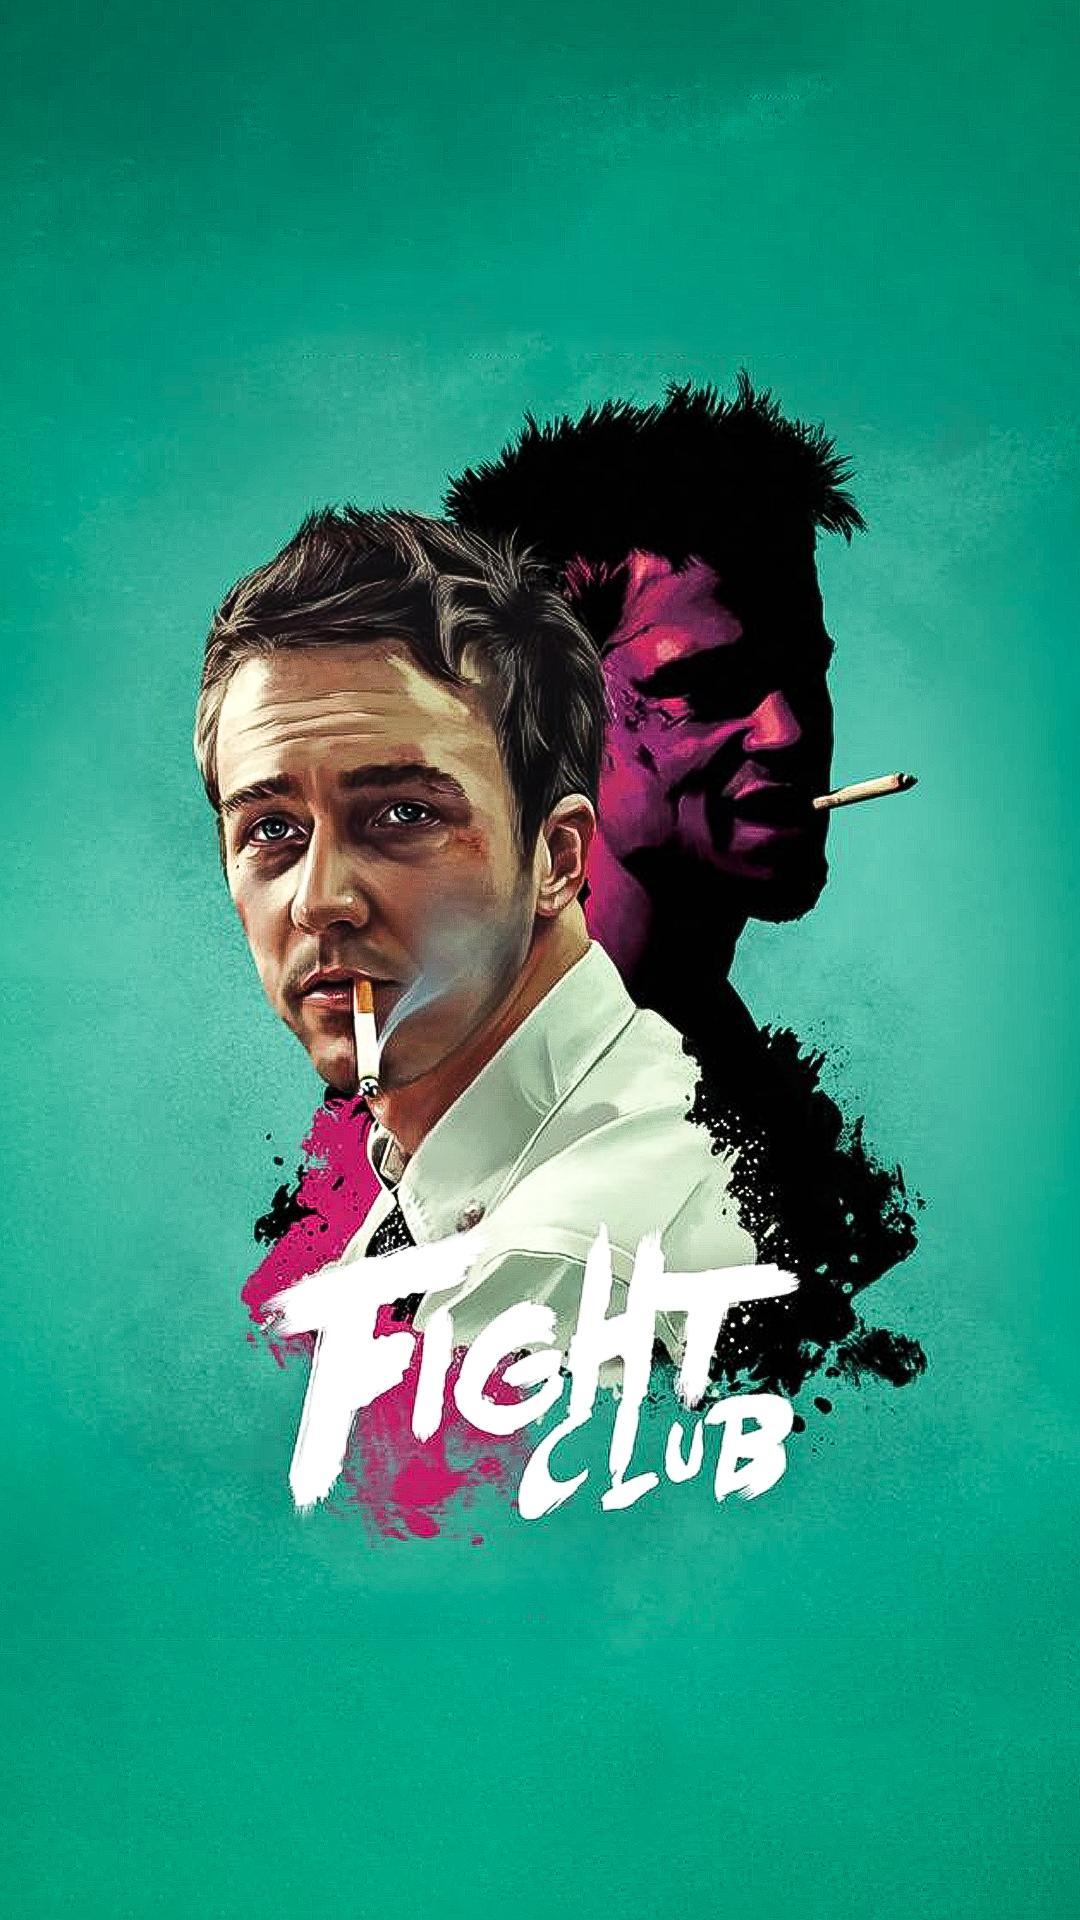 fight club wallpaper,poster,album cover,movie,cool,graphic design